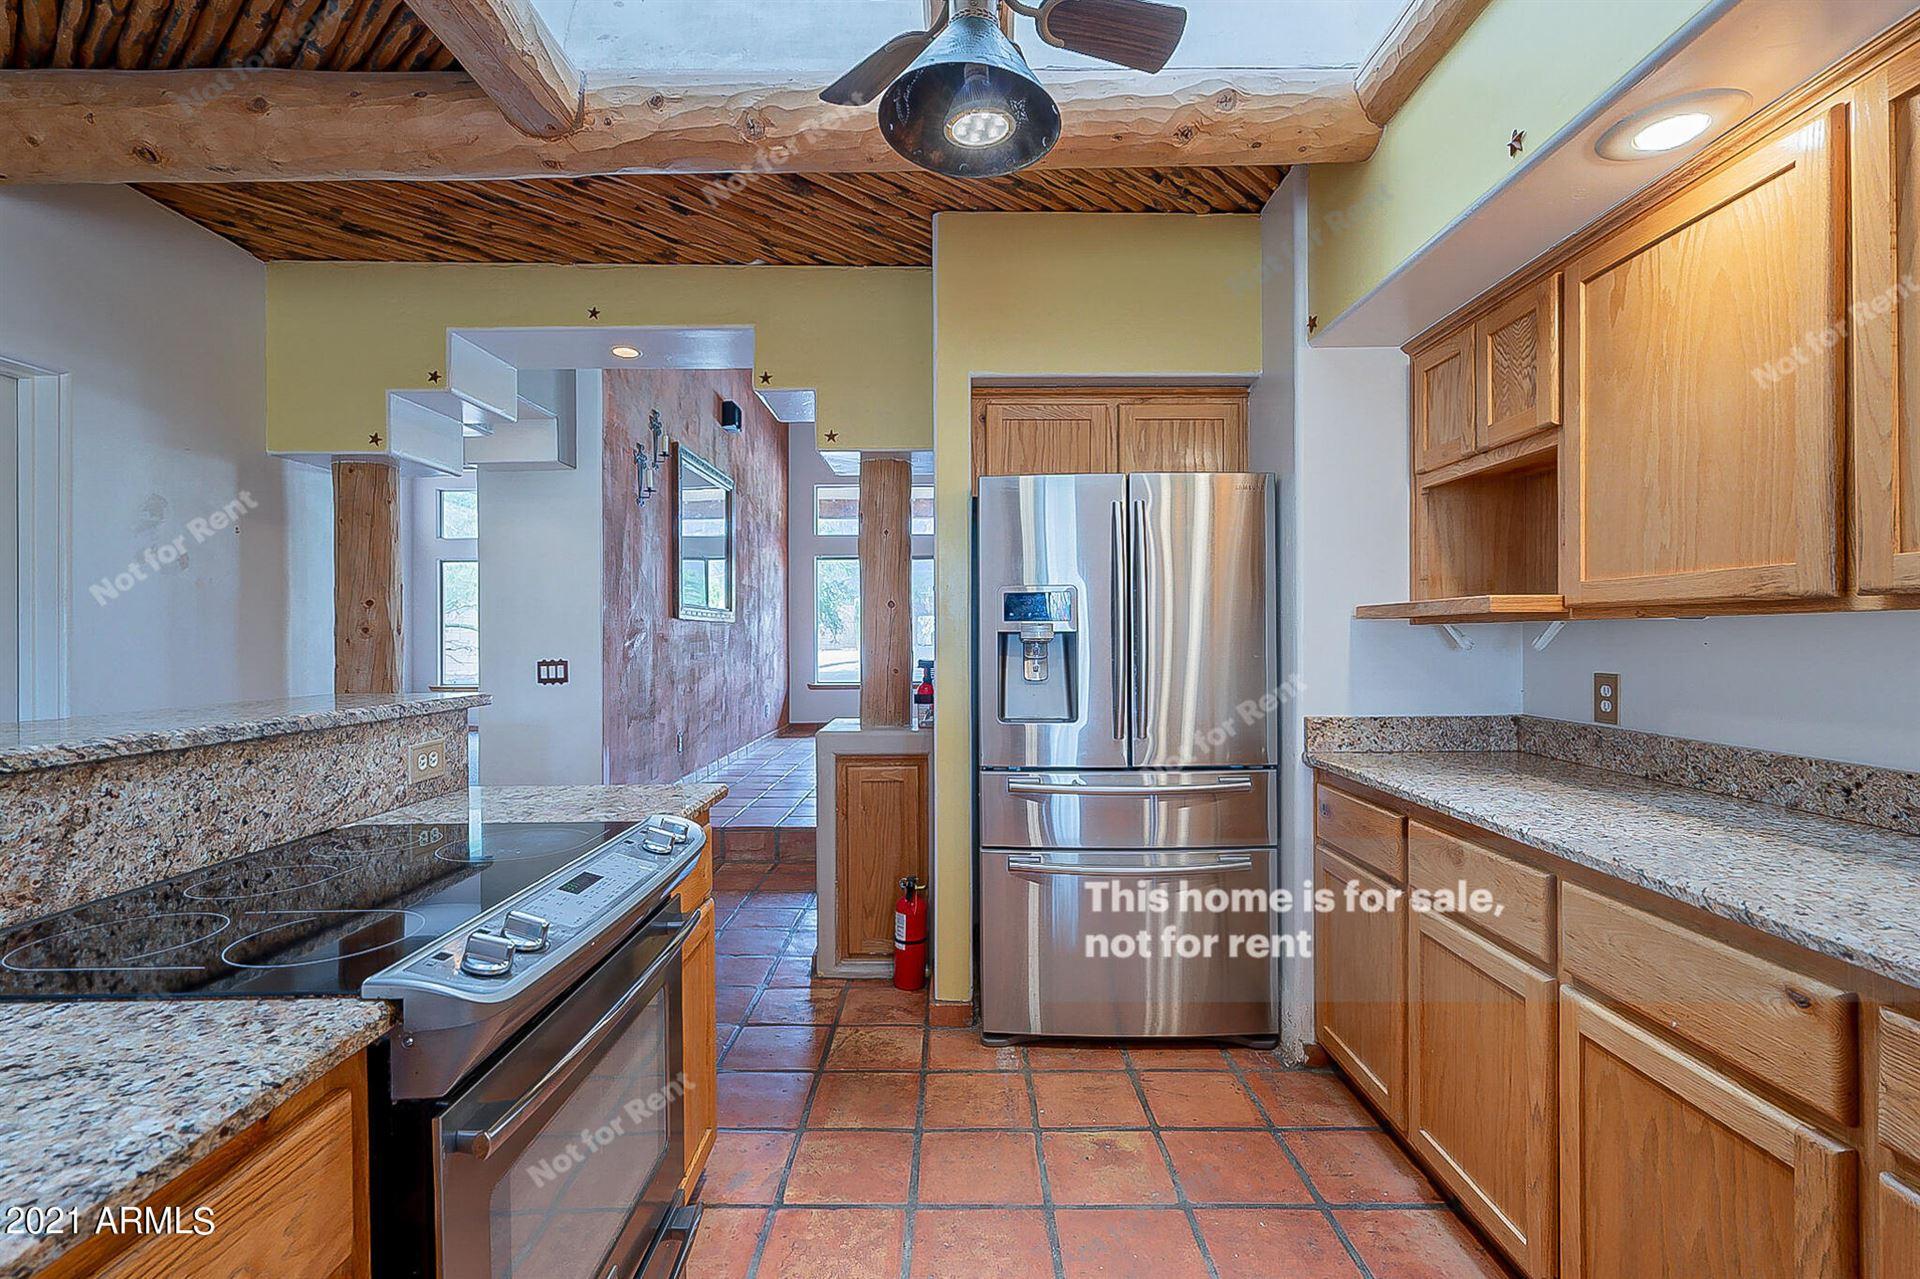 Photo of 370 N DON PERALTA Road, Apache Junction, AZ 85119 (MLS # 6296003)